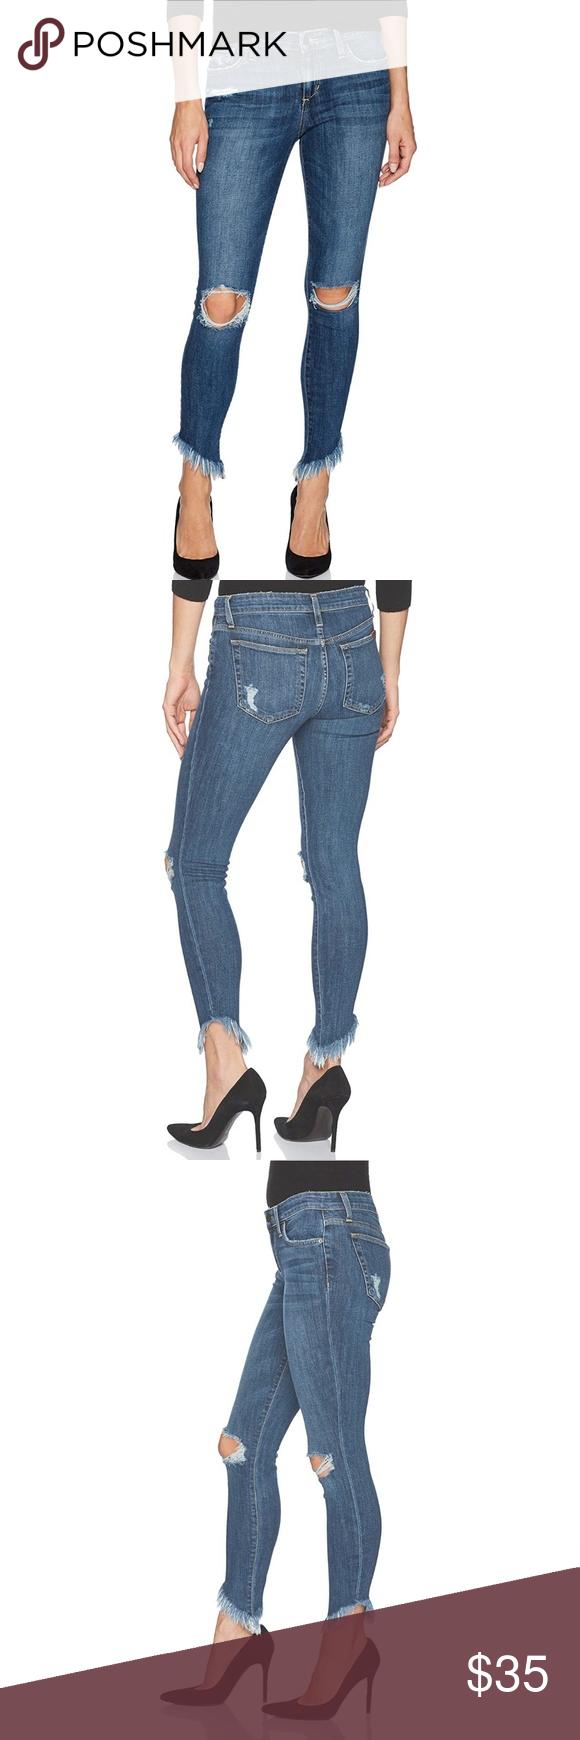 Joes Jeans Womens Diagonal Hem Icon Midrise Skinny Ankle Jean